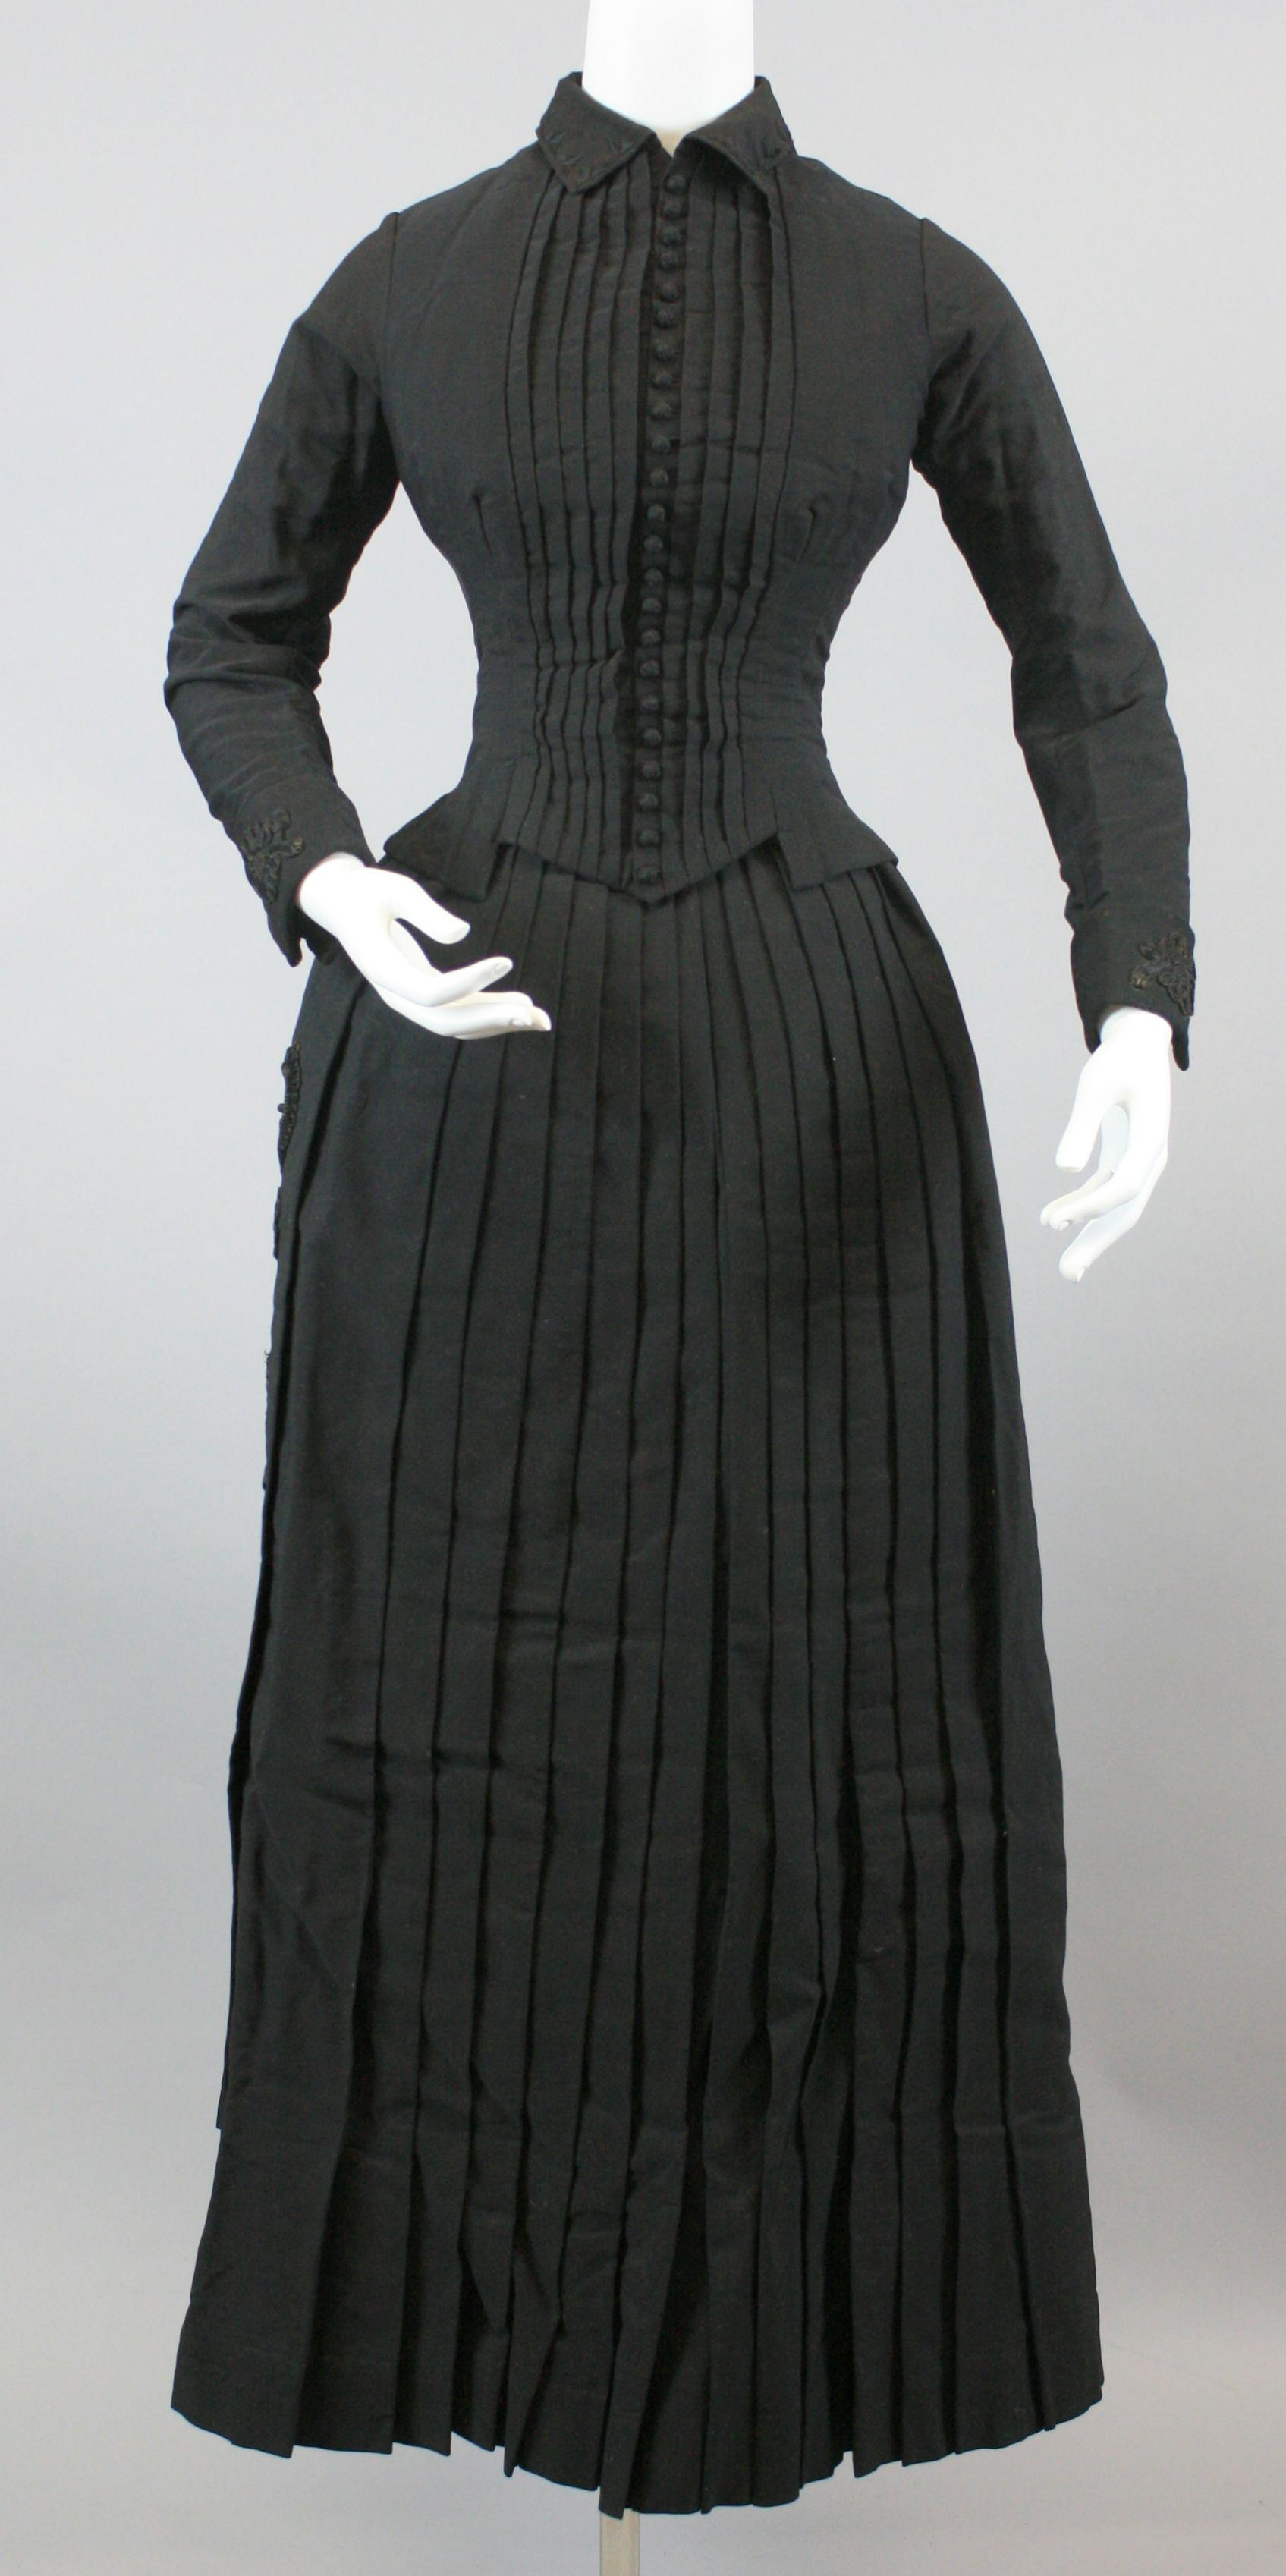 Clothing that tells stories. This dress was worn by Louisa Heileman Mueller, daughter of Gottlieb and Johanna Heileman.